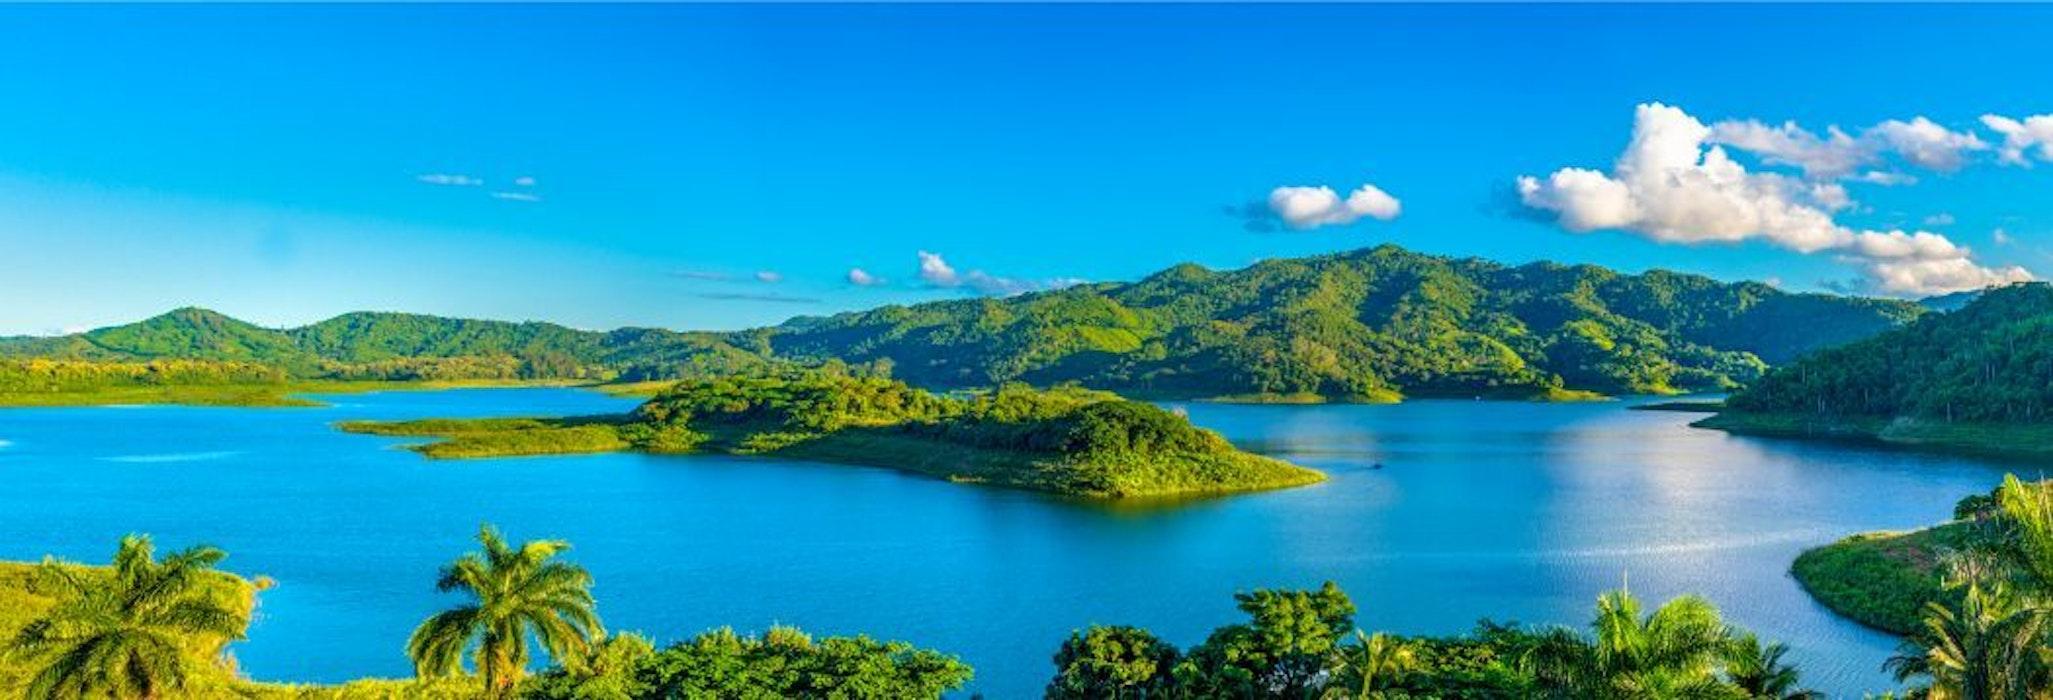 Lake-in-central-Cuba